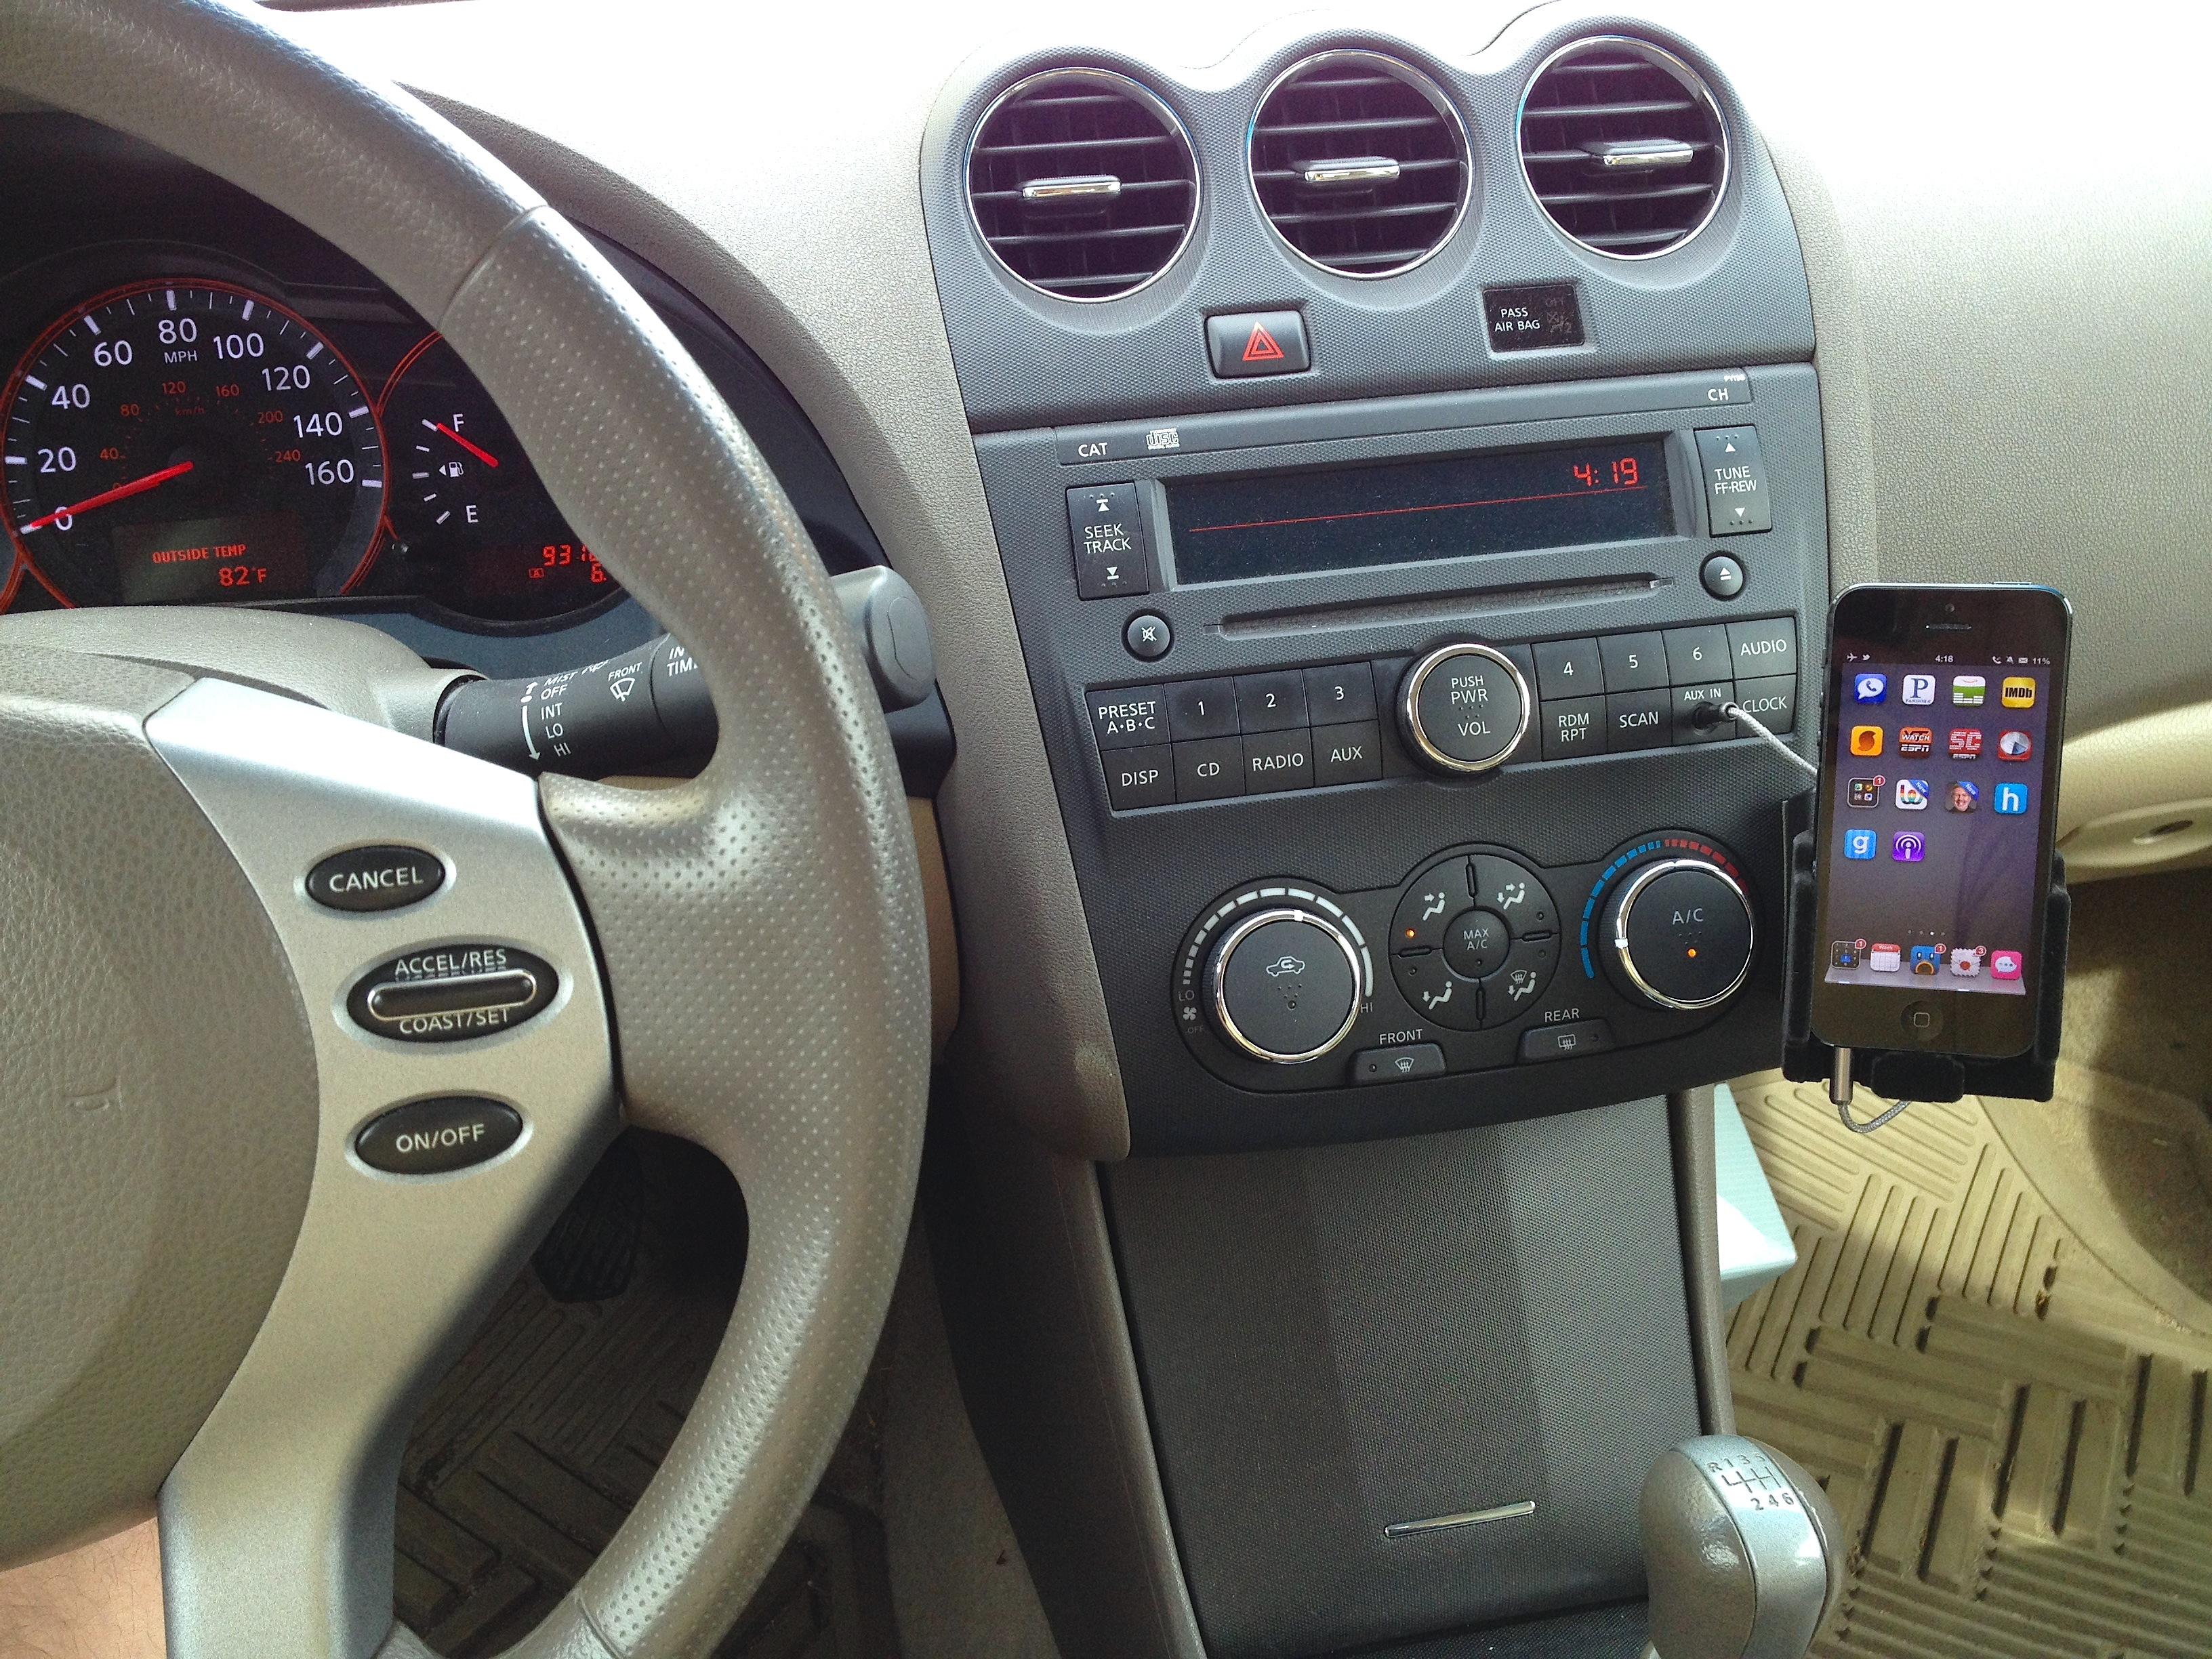 Good car dash holders for 6P? : Nexus6P